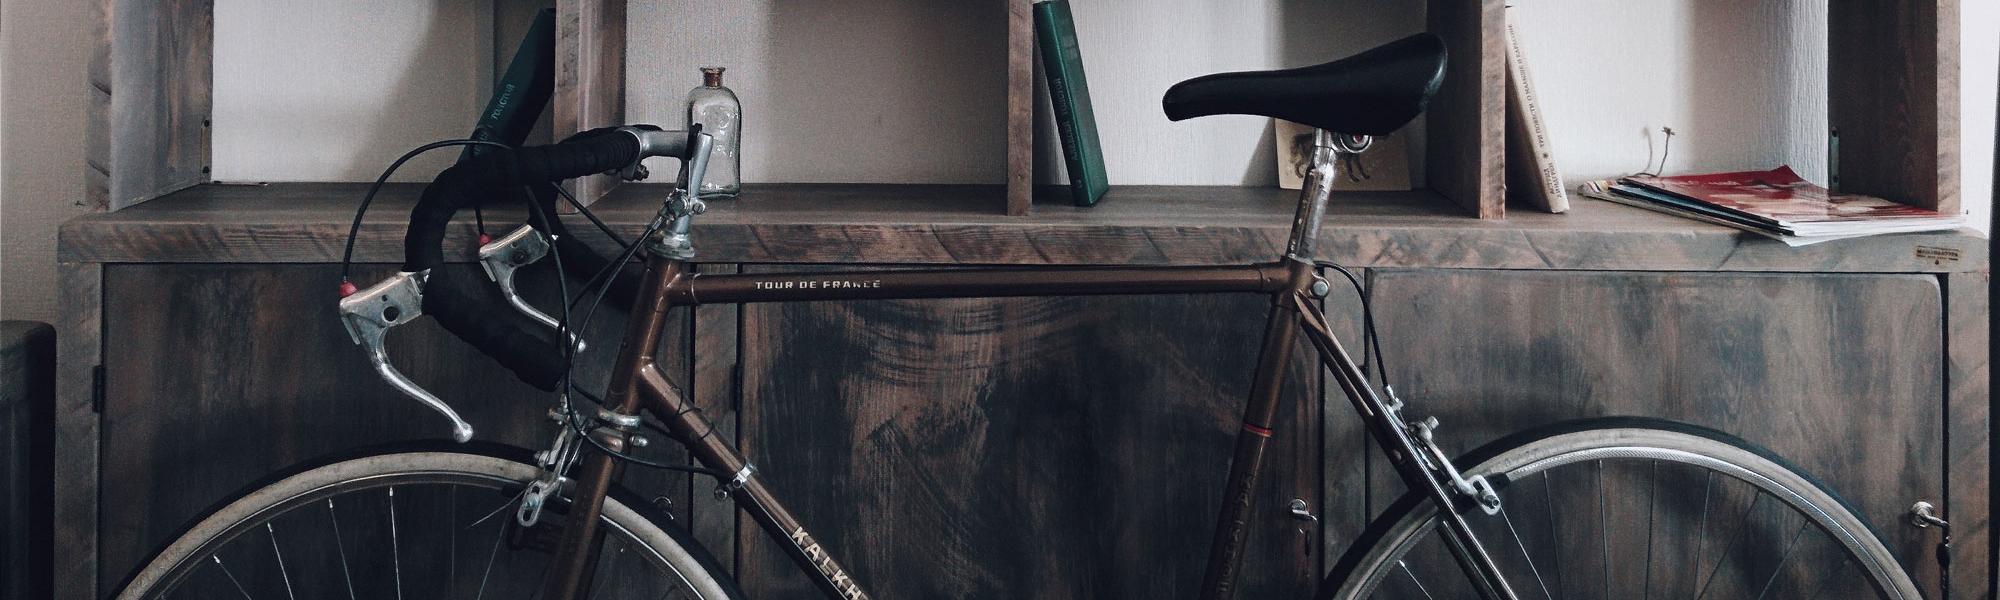 Bicycle Photo byRoman MageronUnsplash